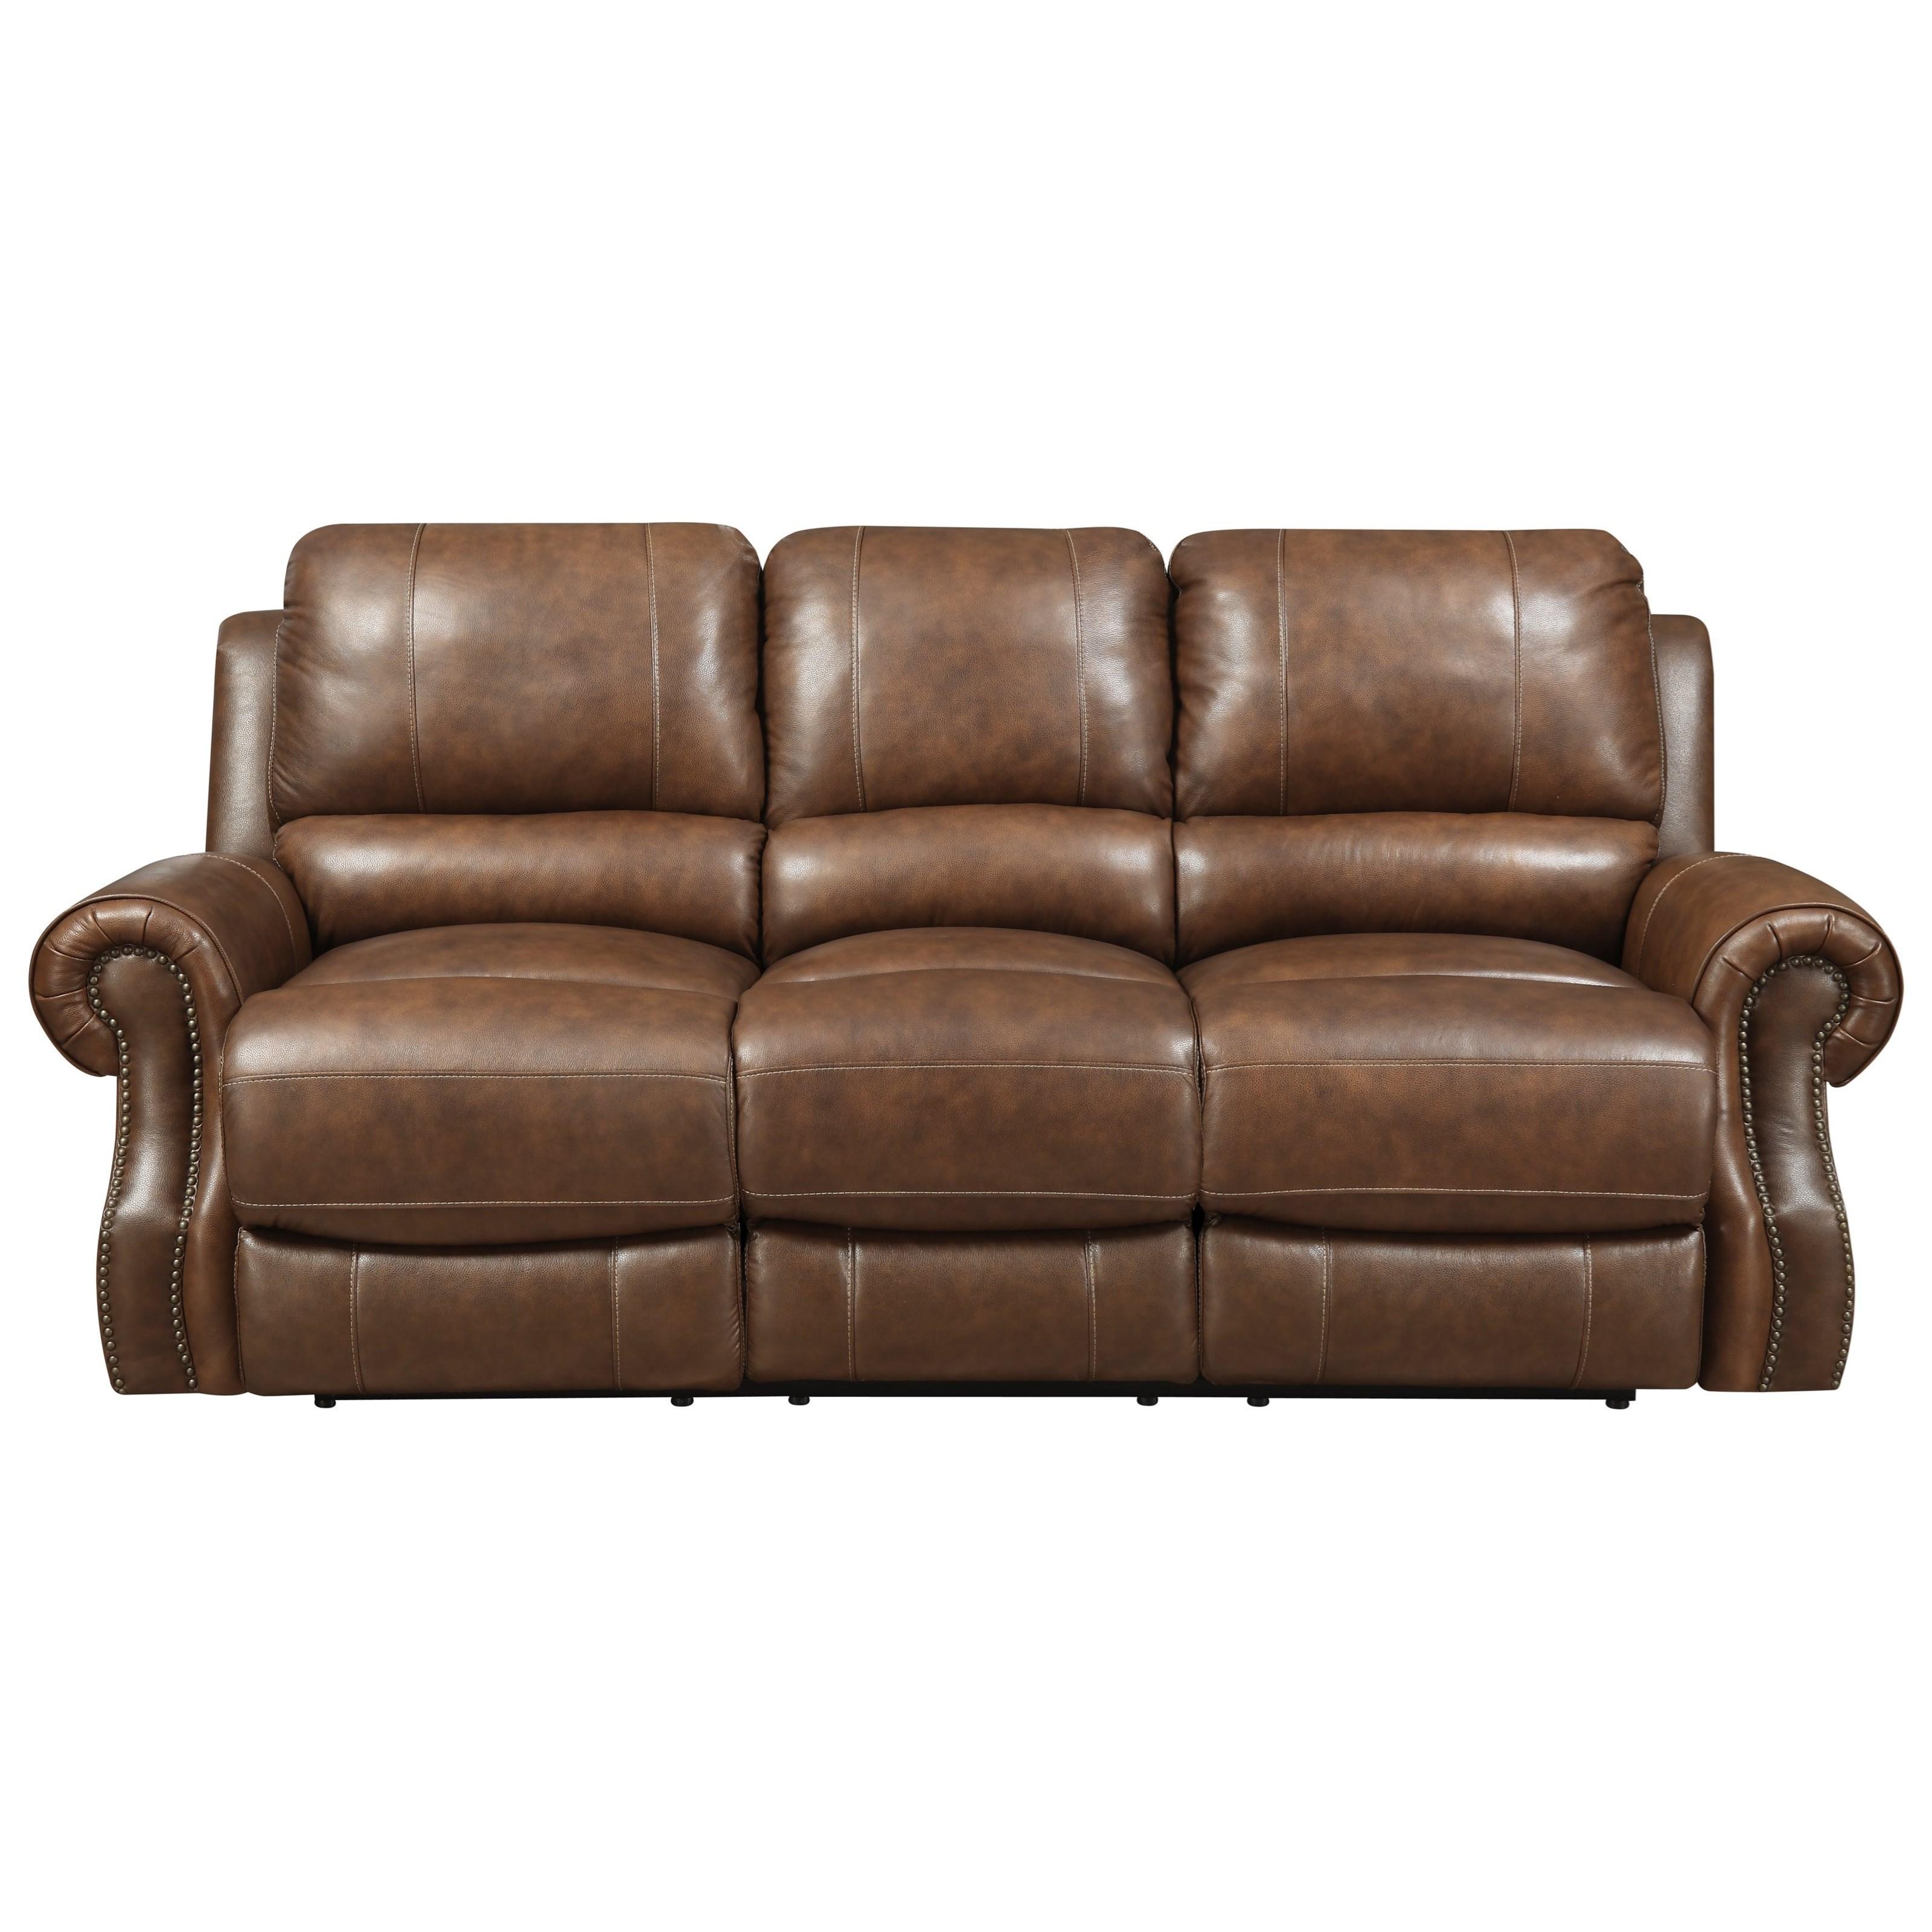 Merveilleux Elements International WalkerPower Motion Sofa ...